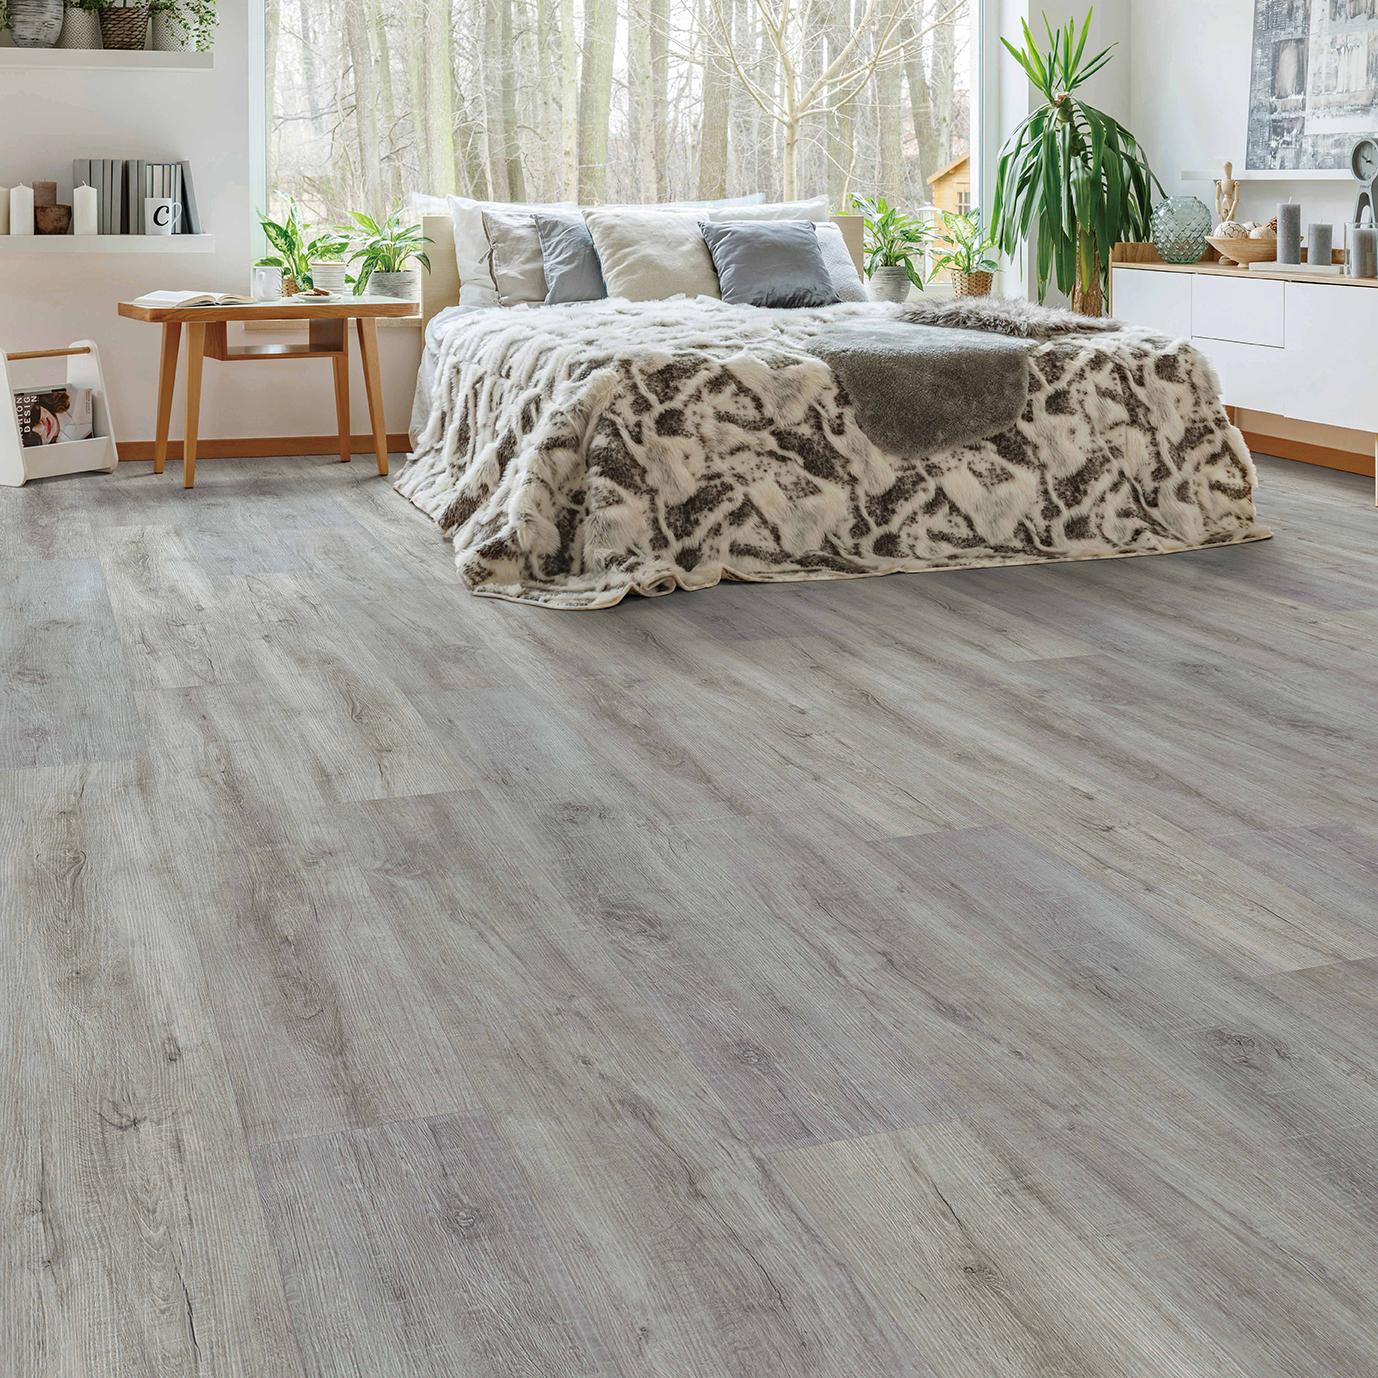 Next Floor - Expanse Plank - 527 714.jpg